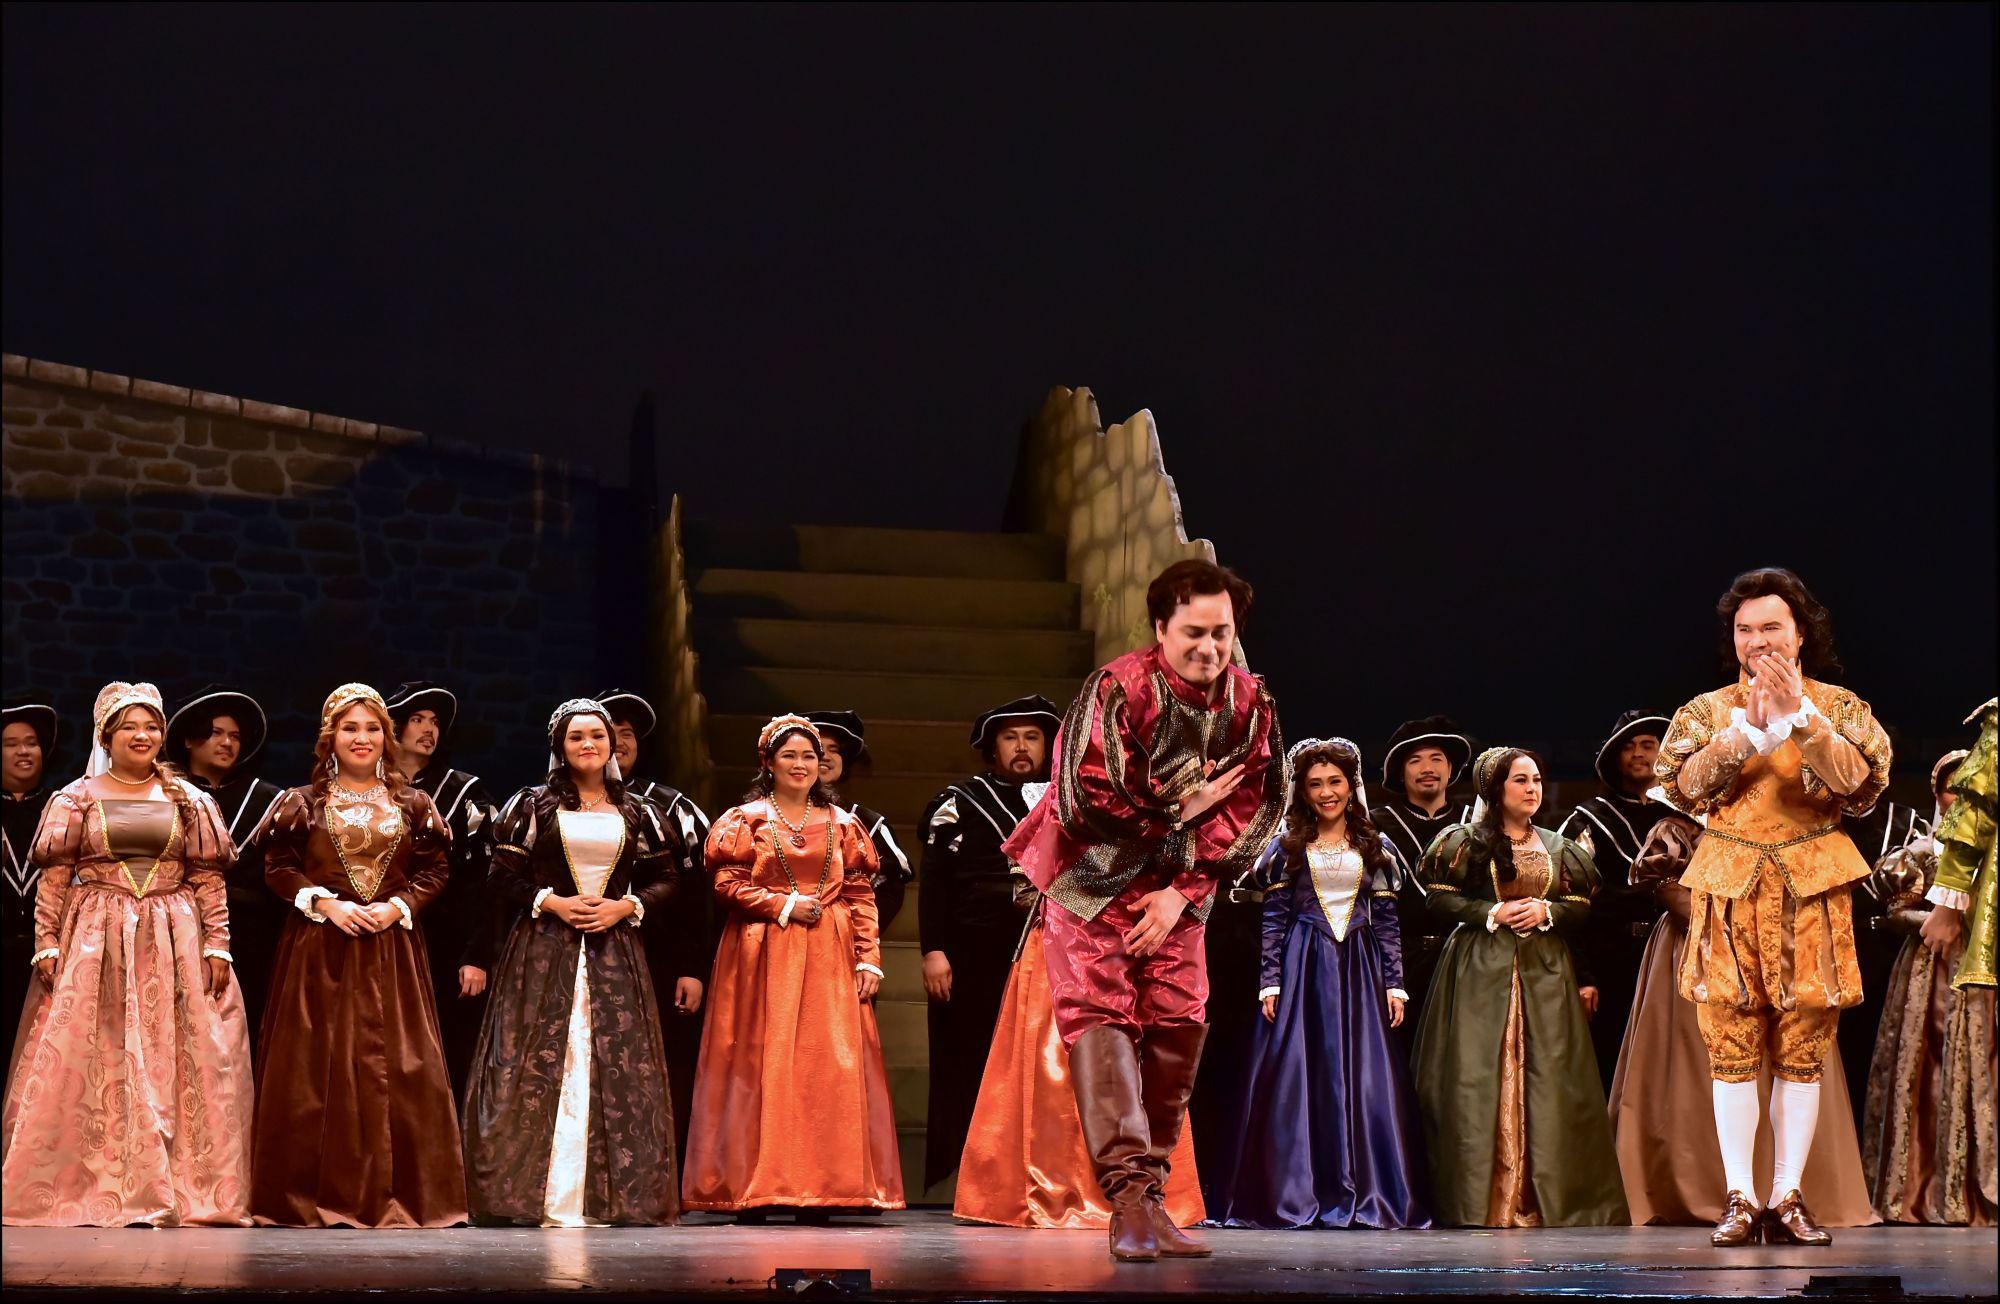 A Night at the Opera: Lucia di Lammermoor by Gaetano Donizetti at the CCP